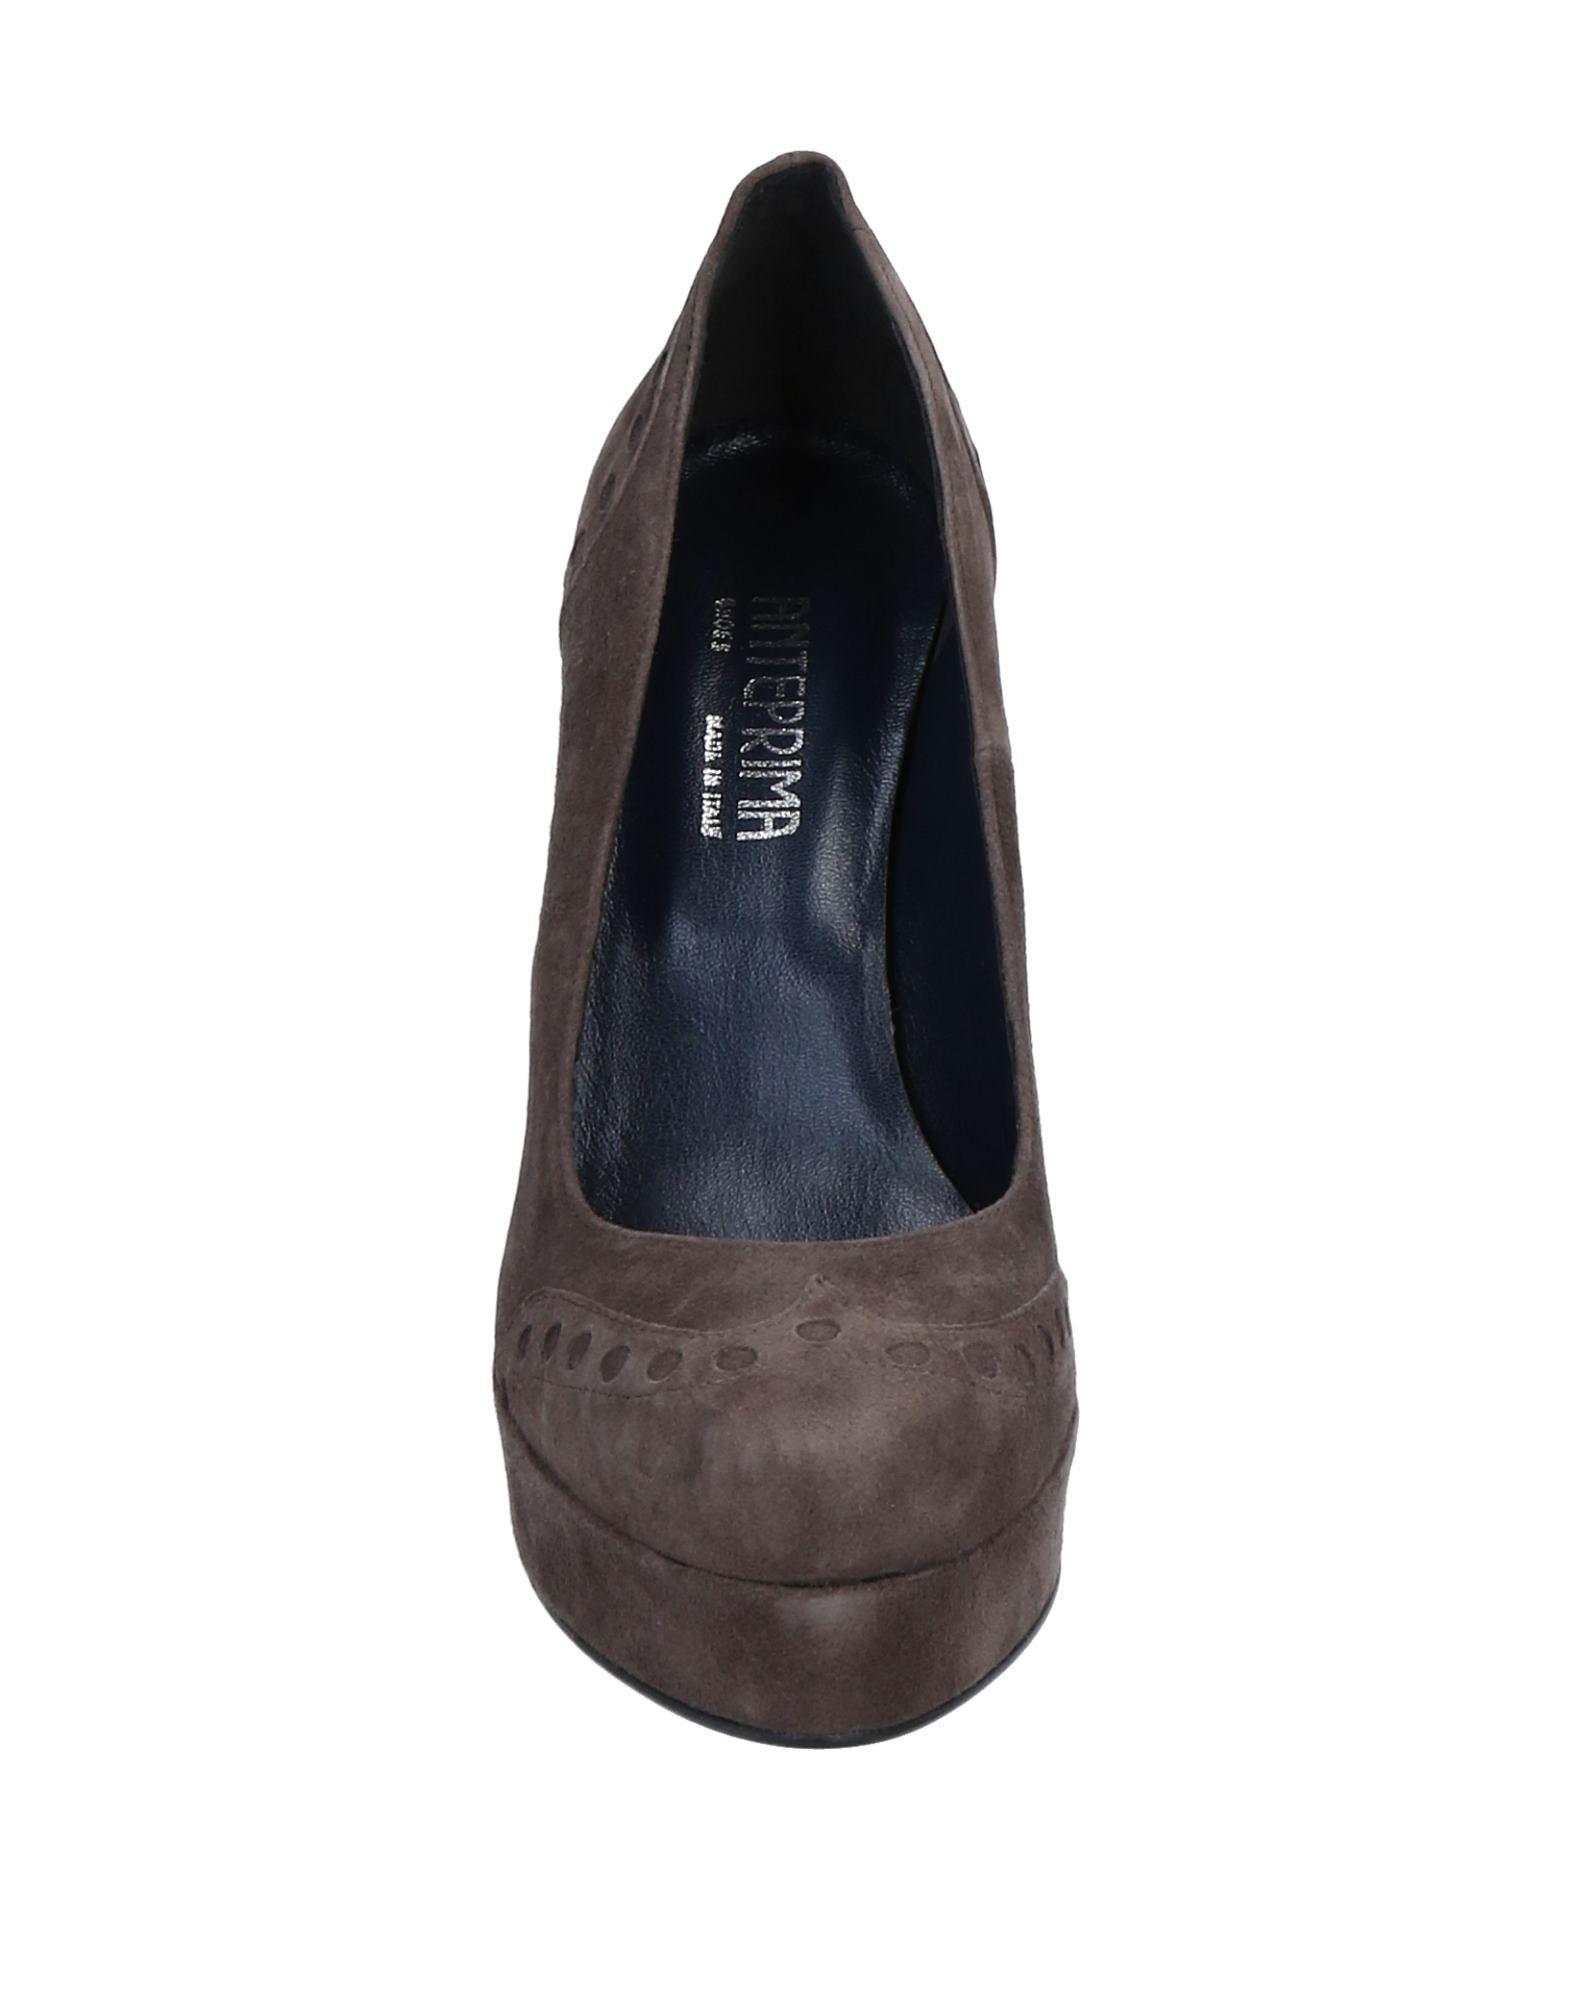 Anteprima Pumps Damen  11499138EO 11499138EO 11499138EO Gute Qualität beliebte Schuhe ef096b